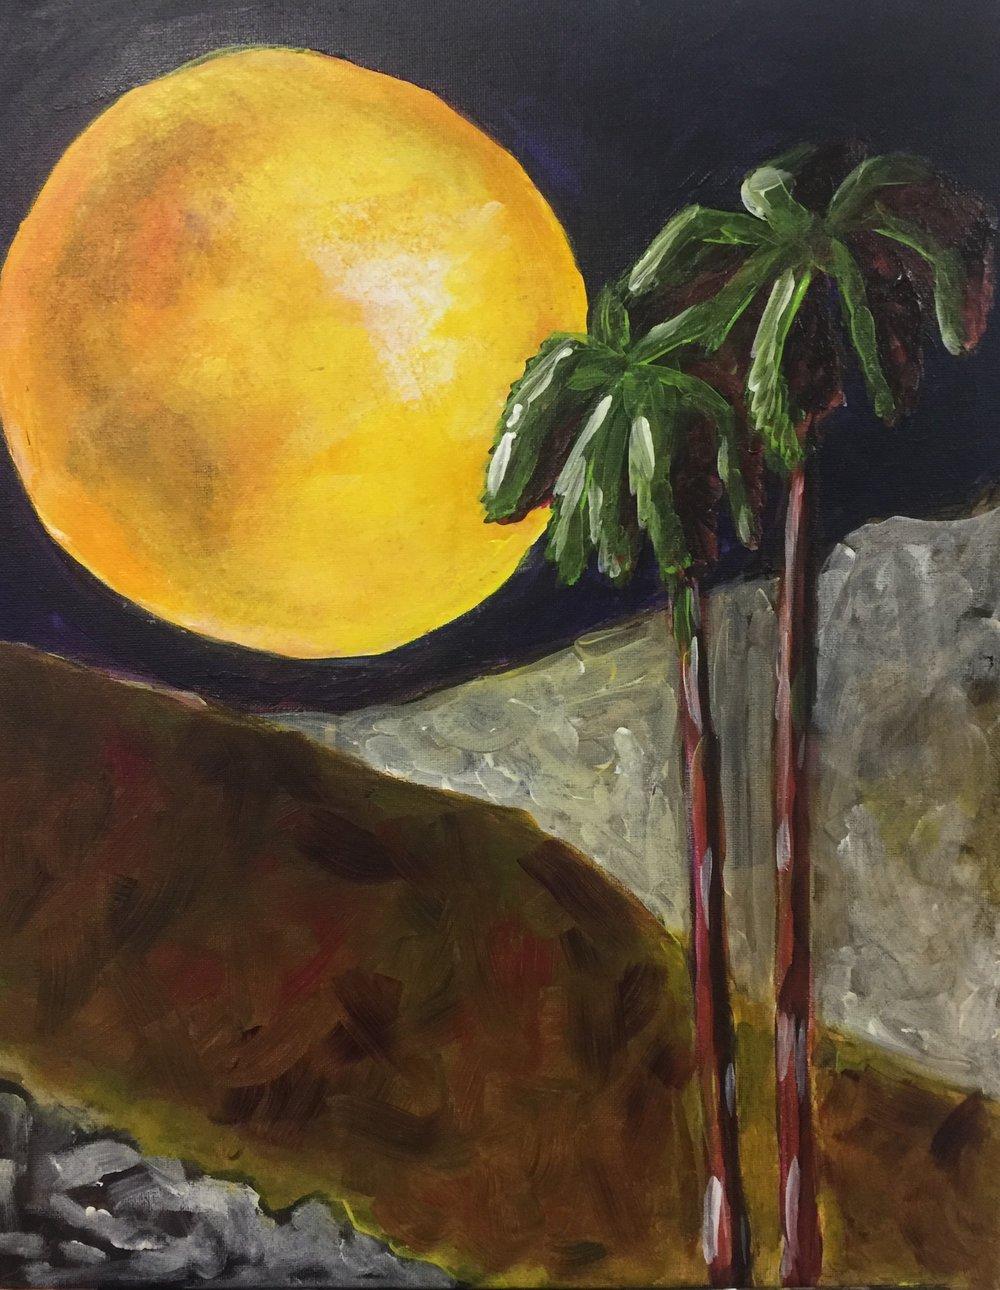 Harvest Moon - 16 x 20